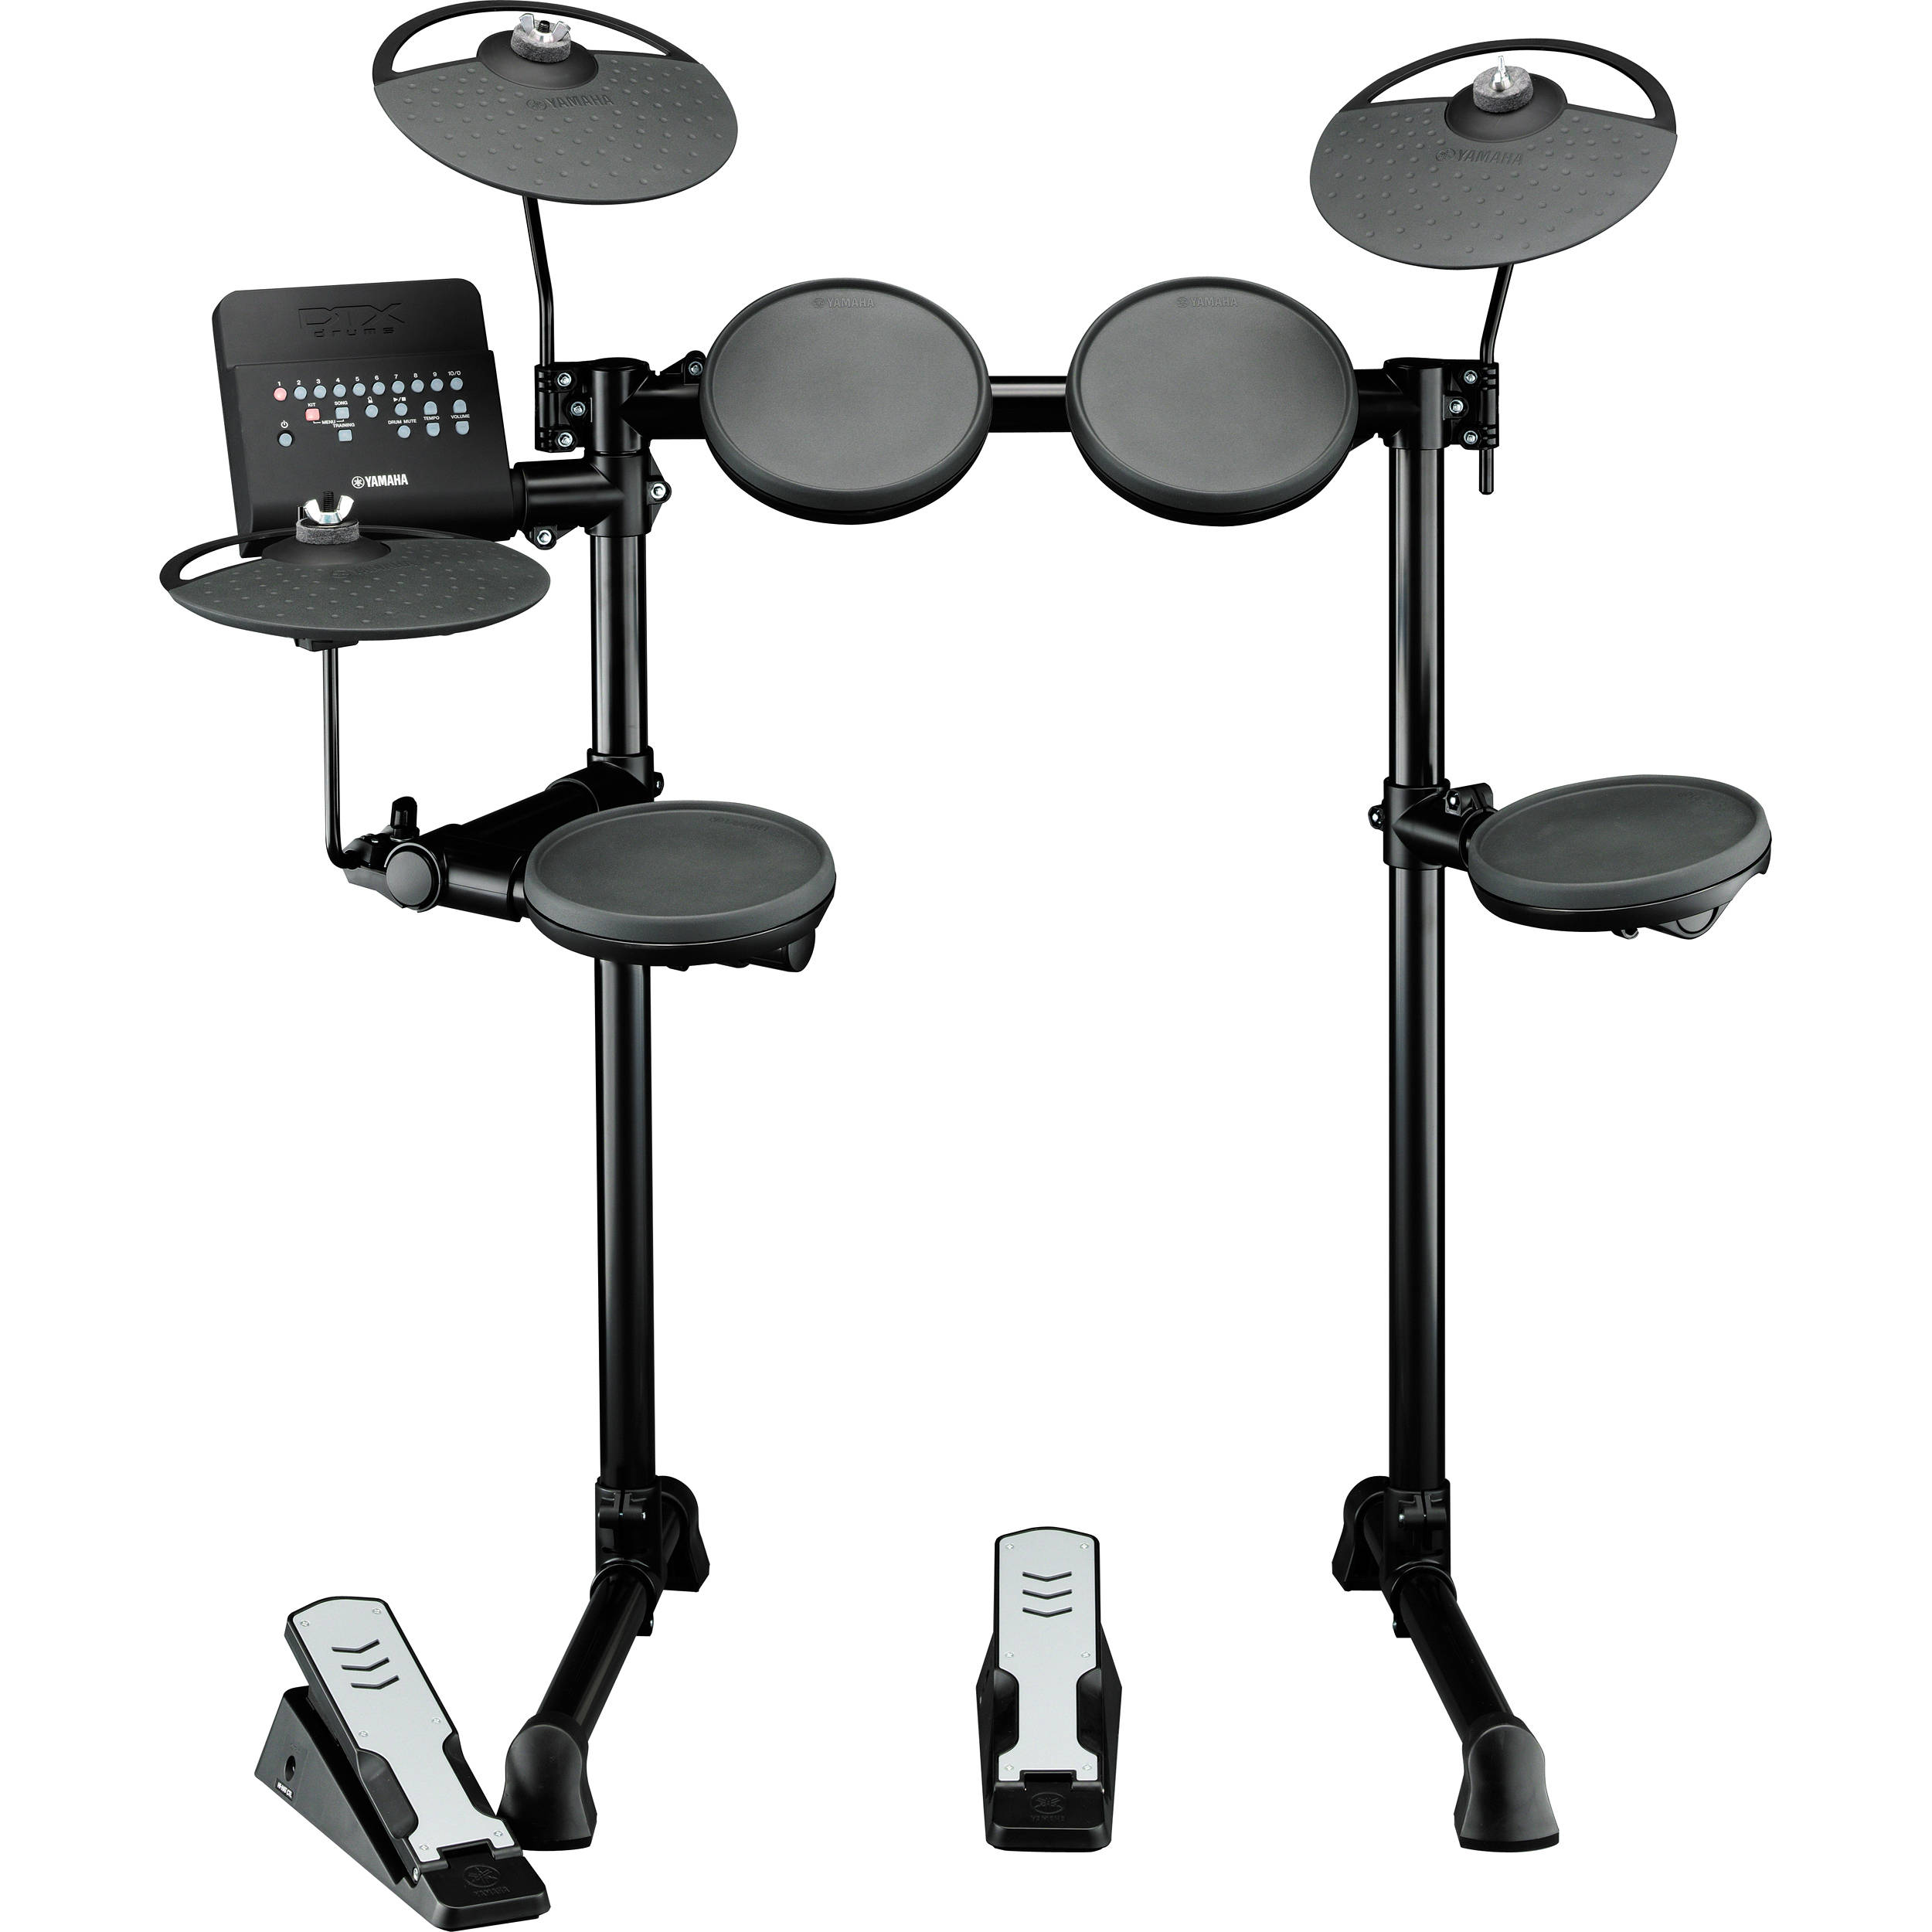 yamaha dtx400k electronic drum kit dtx400k b h photo video. Black Bedroom Furniture Sets. Home Design Ideas